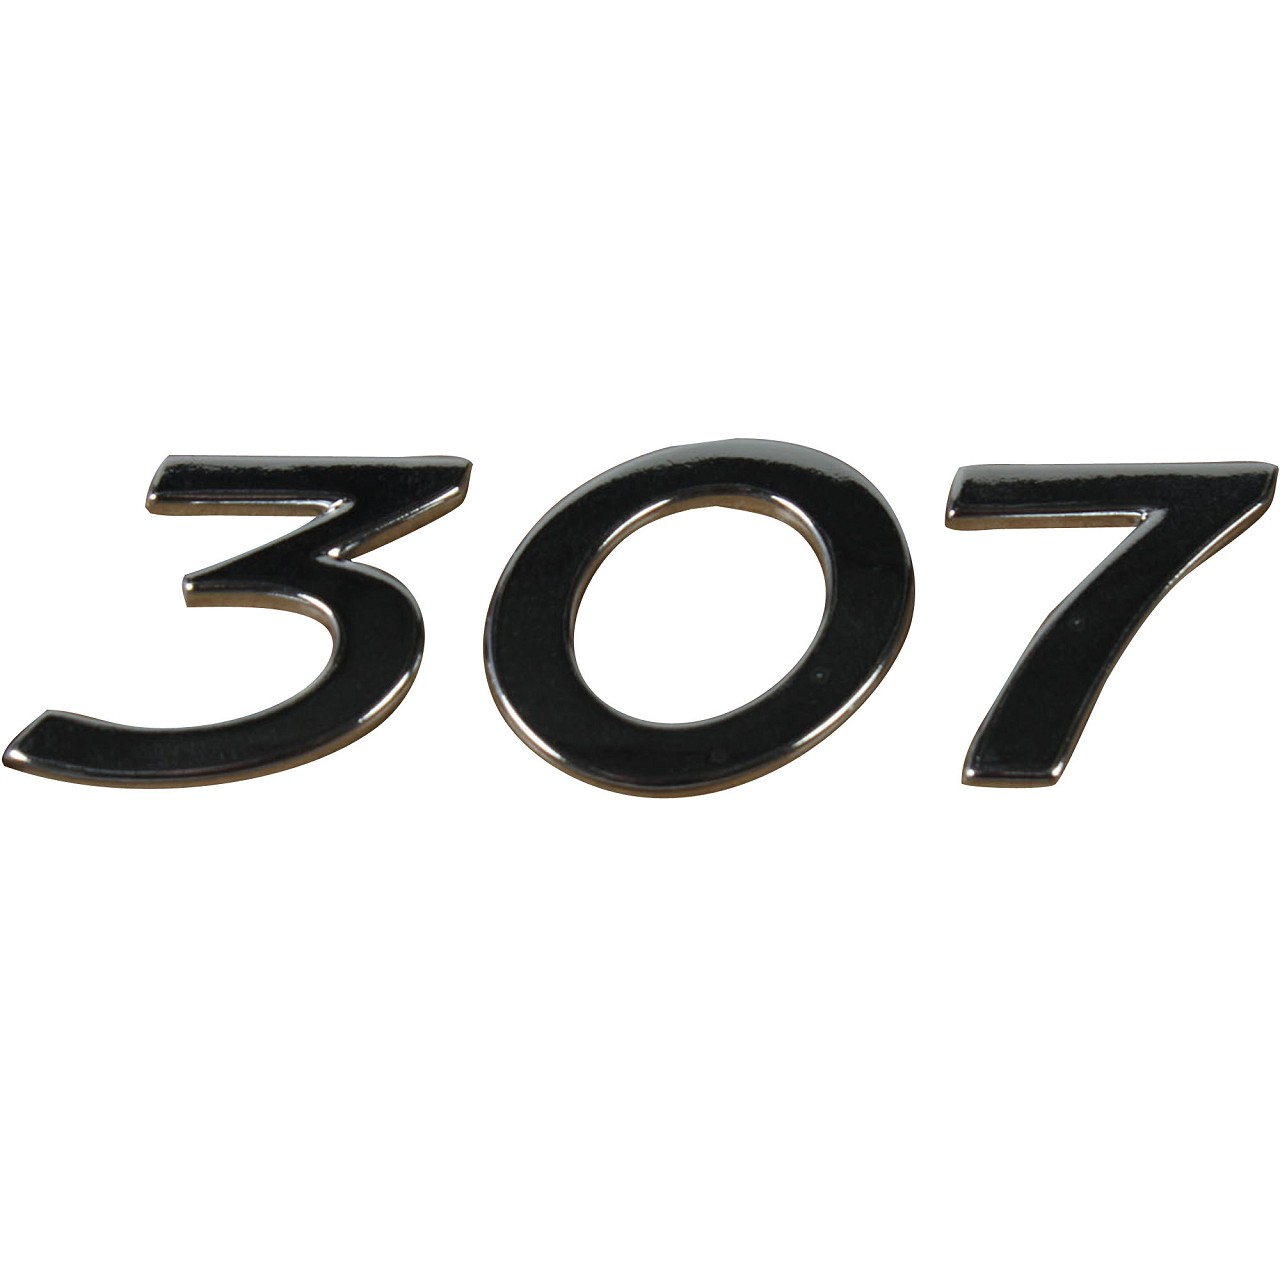 ORIGINAL Peugeot Emblem Plakette Logo Schriftzug Heckklappe 307 8665.C1